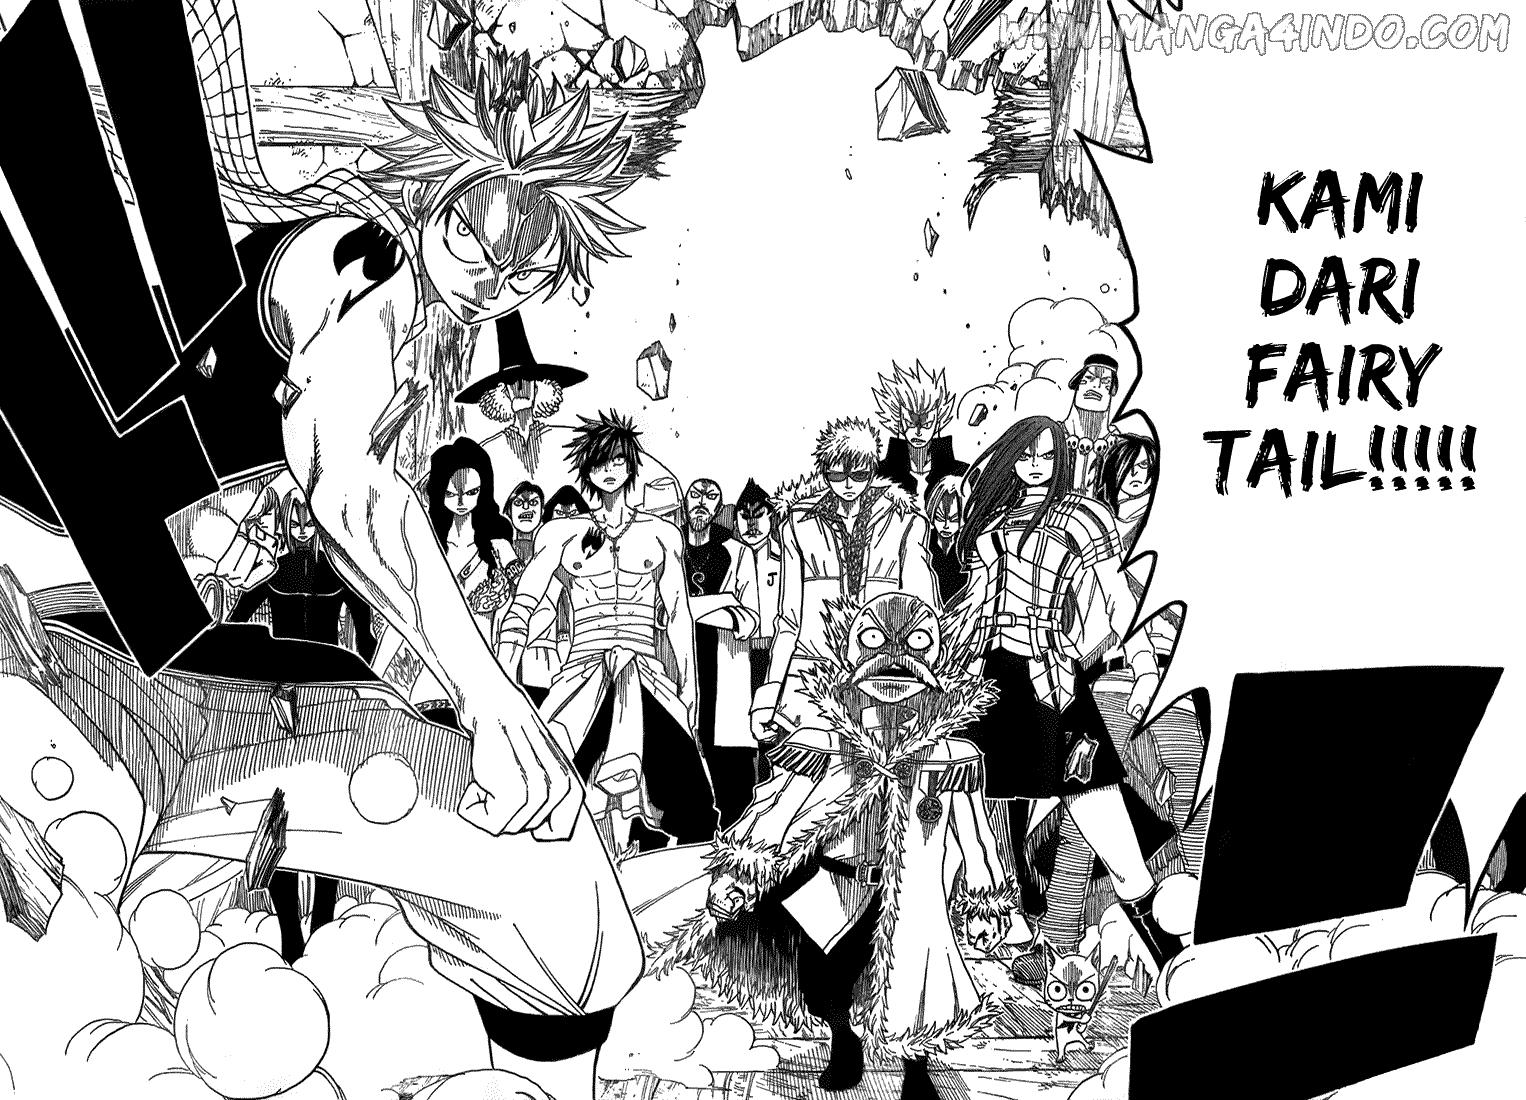 Fairy Tail Bahasa Indonesia - www.manga4indo.com - Jika Gambar Tidak Keluar, Silahkan Tekan F5